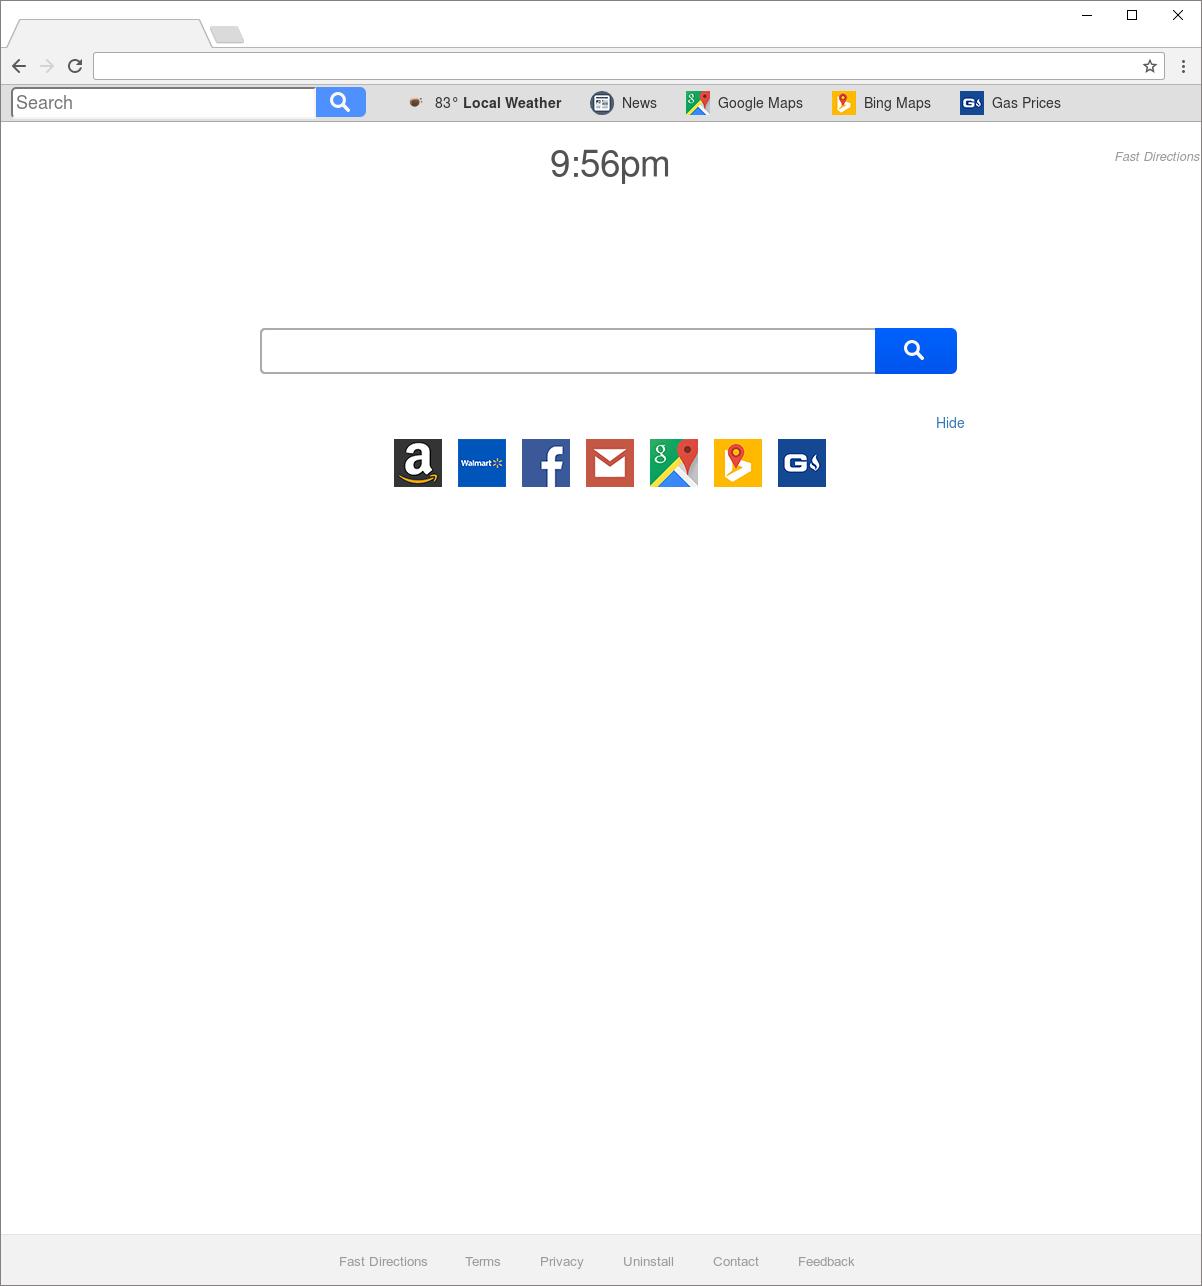 Search.searchjsfd.com Hijacker